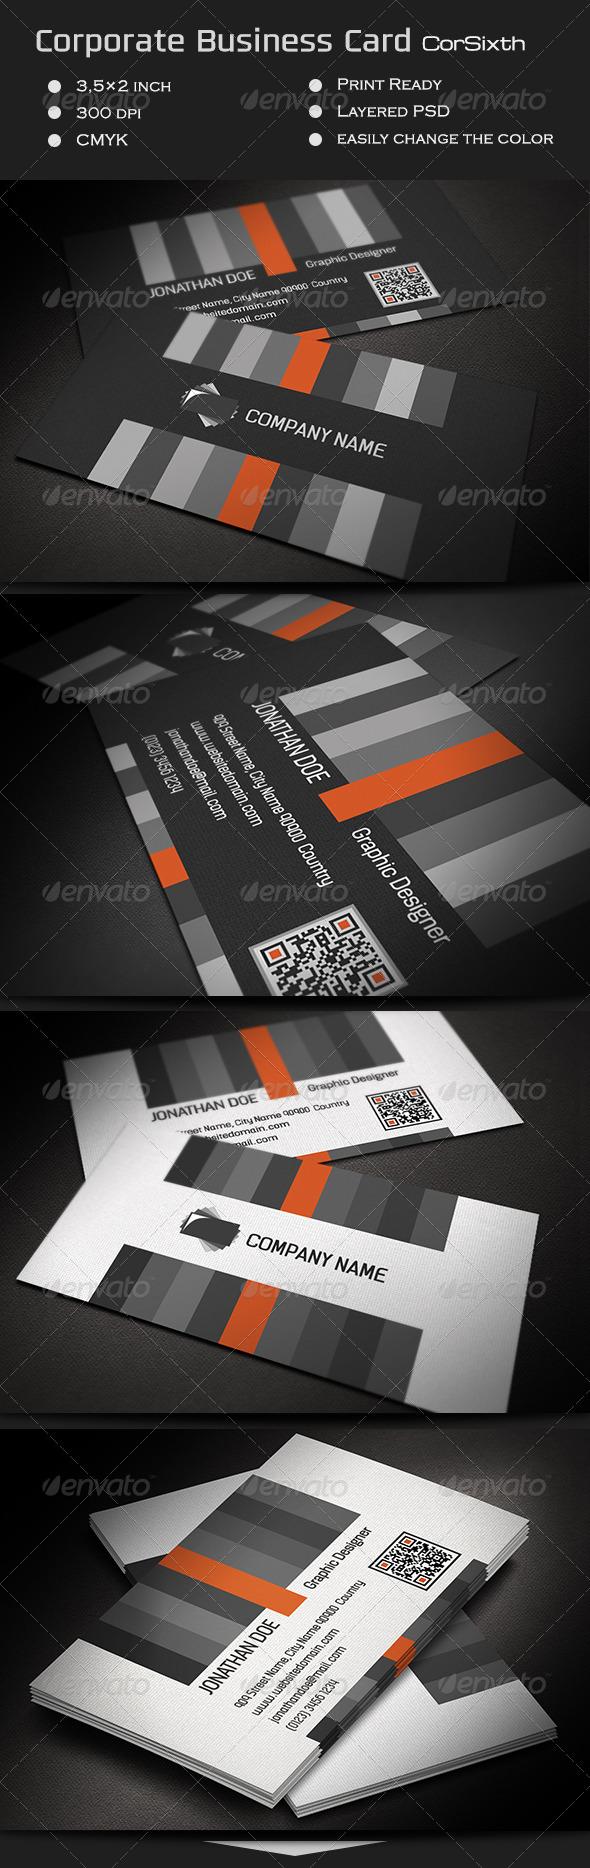 Corporate Business Card CorSixth - Corporate Business Cards